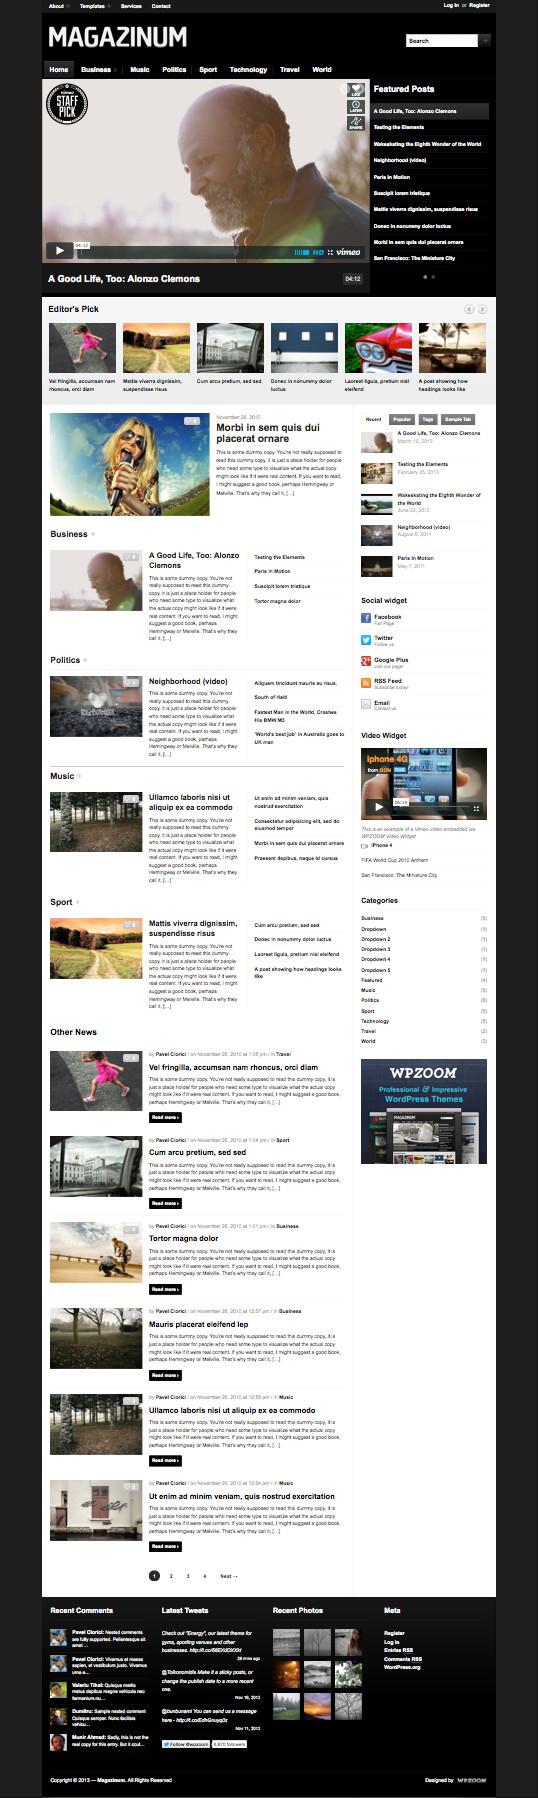 Magazinum 3.0 WordPress Theme